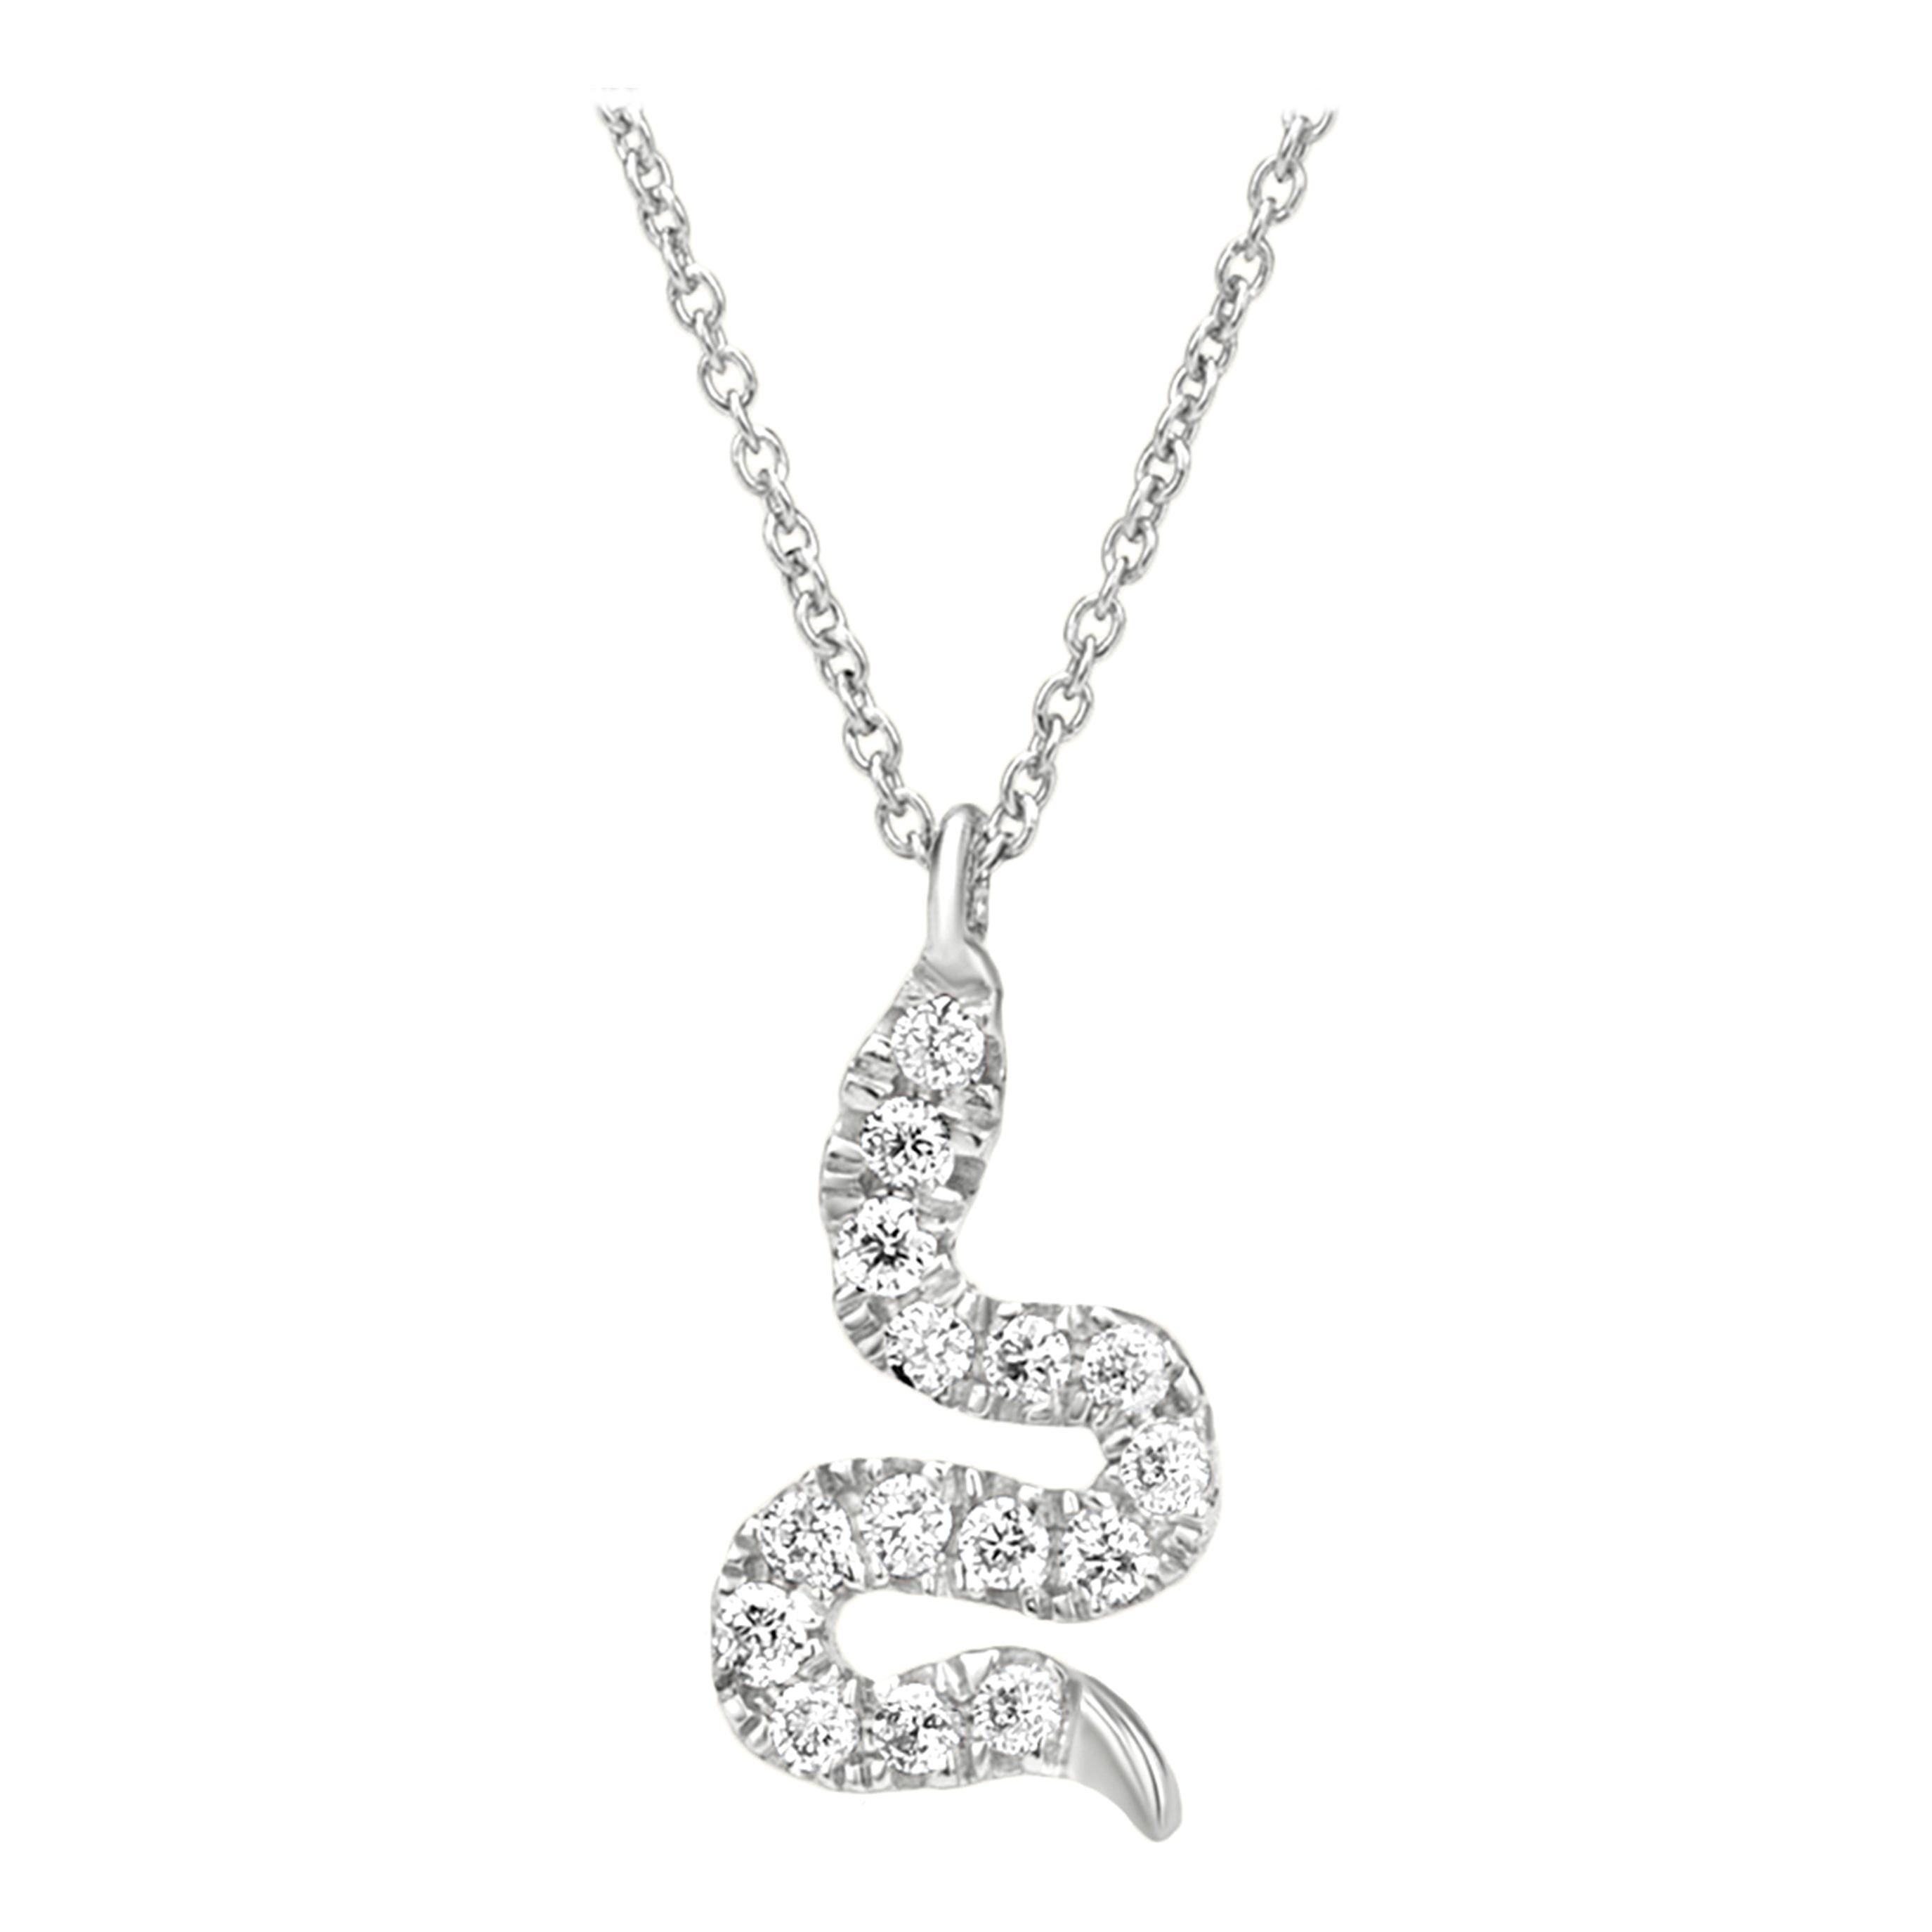 Snake Diamond Pendant Necklace in 18k White Gold